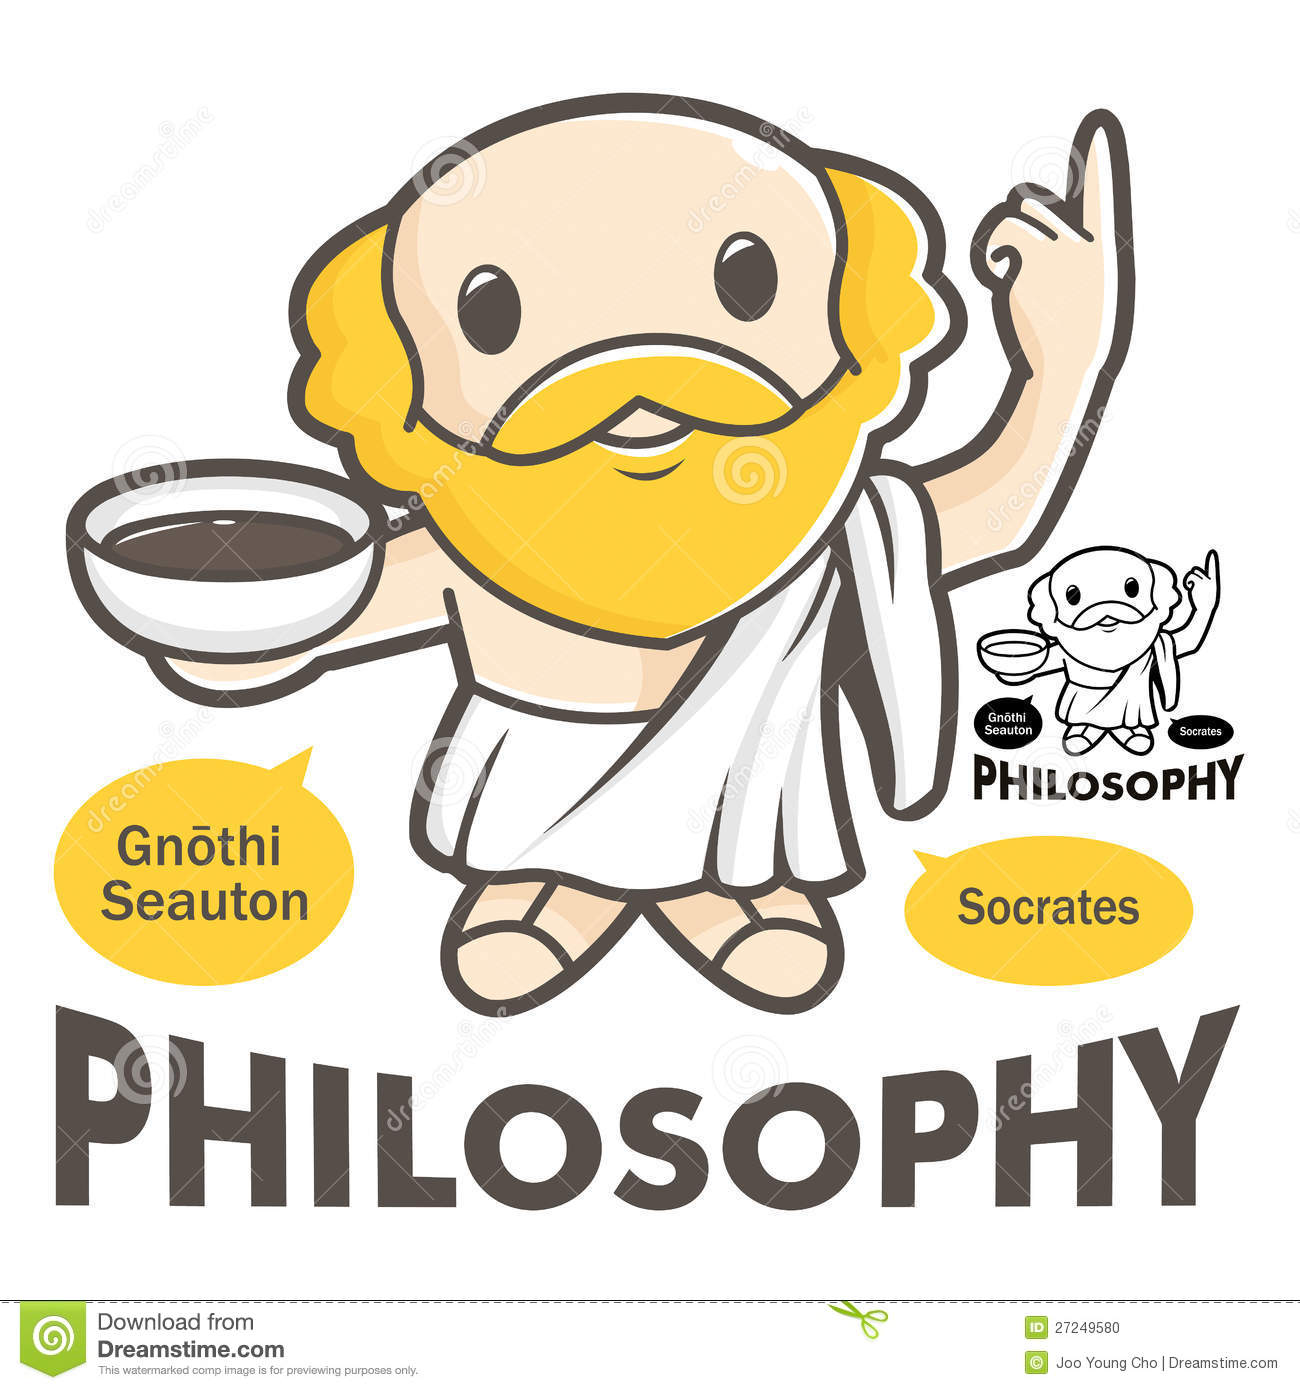 Socrates clipart Philosopher Clipart Images Clipart Panda Clipart Free